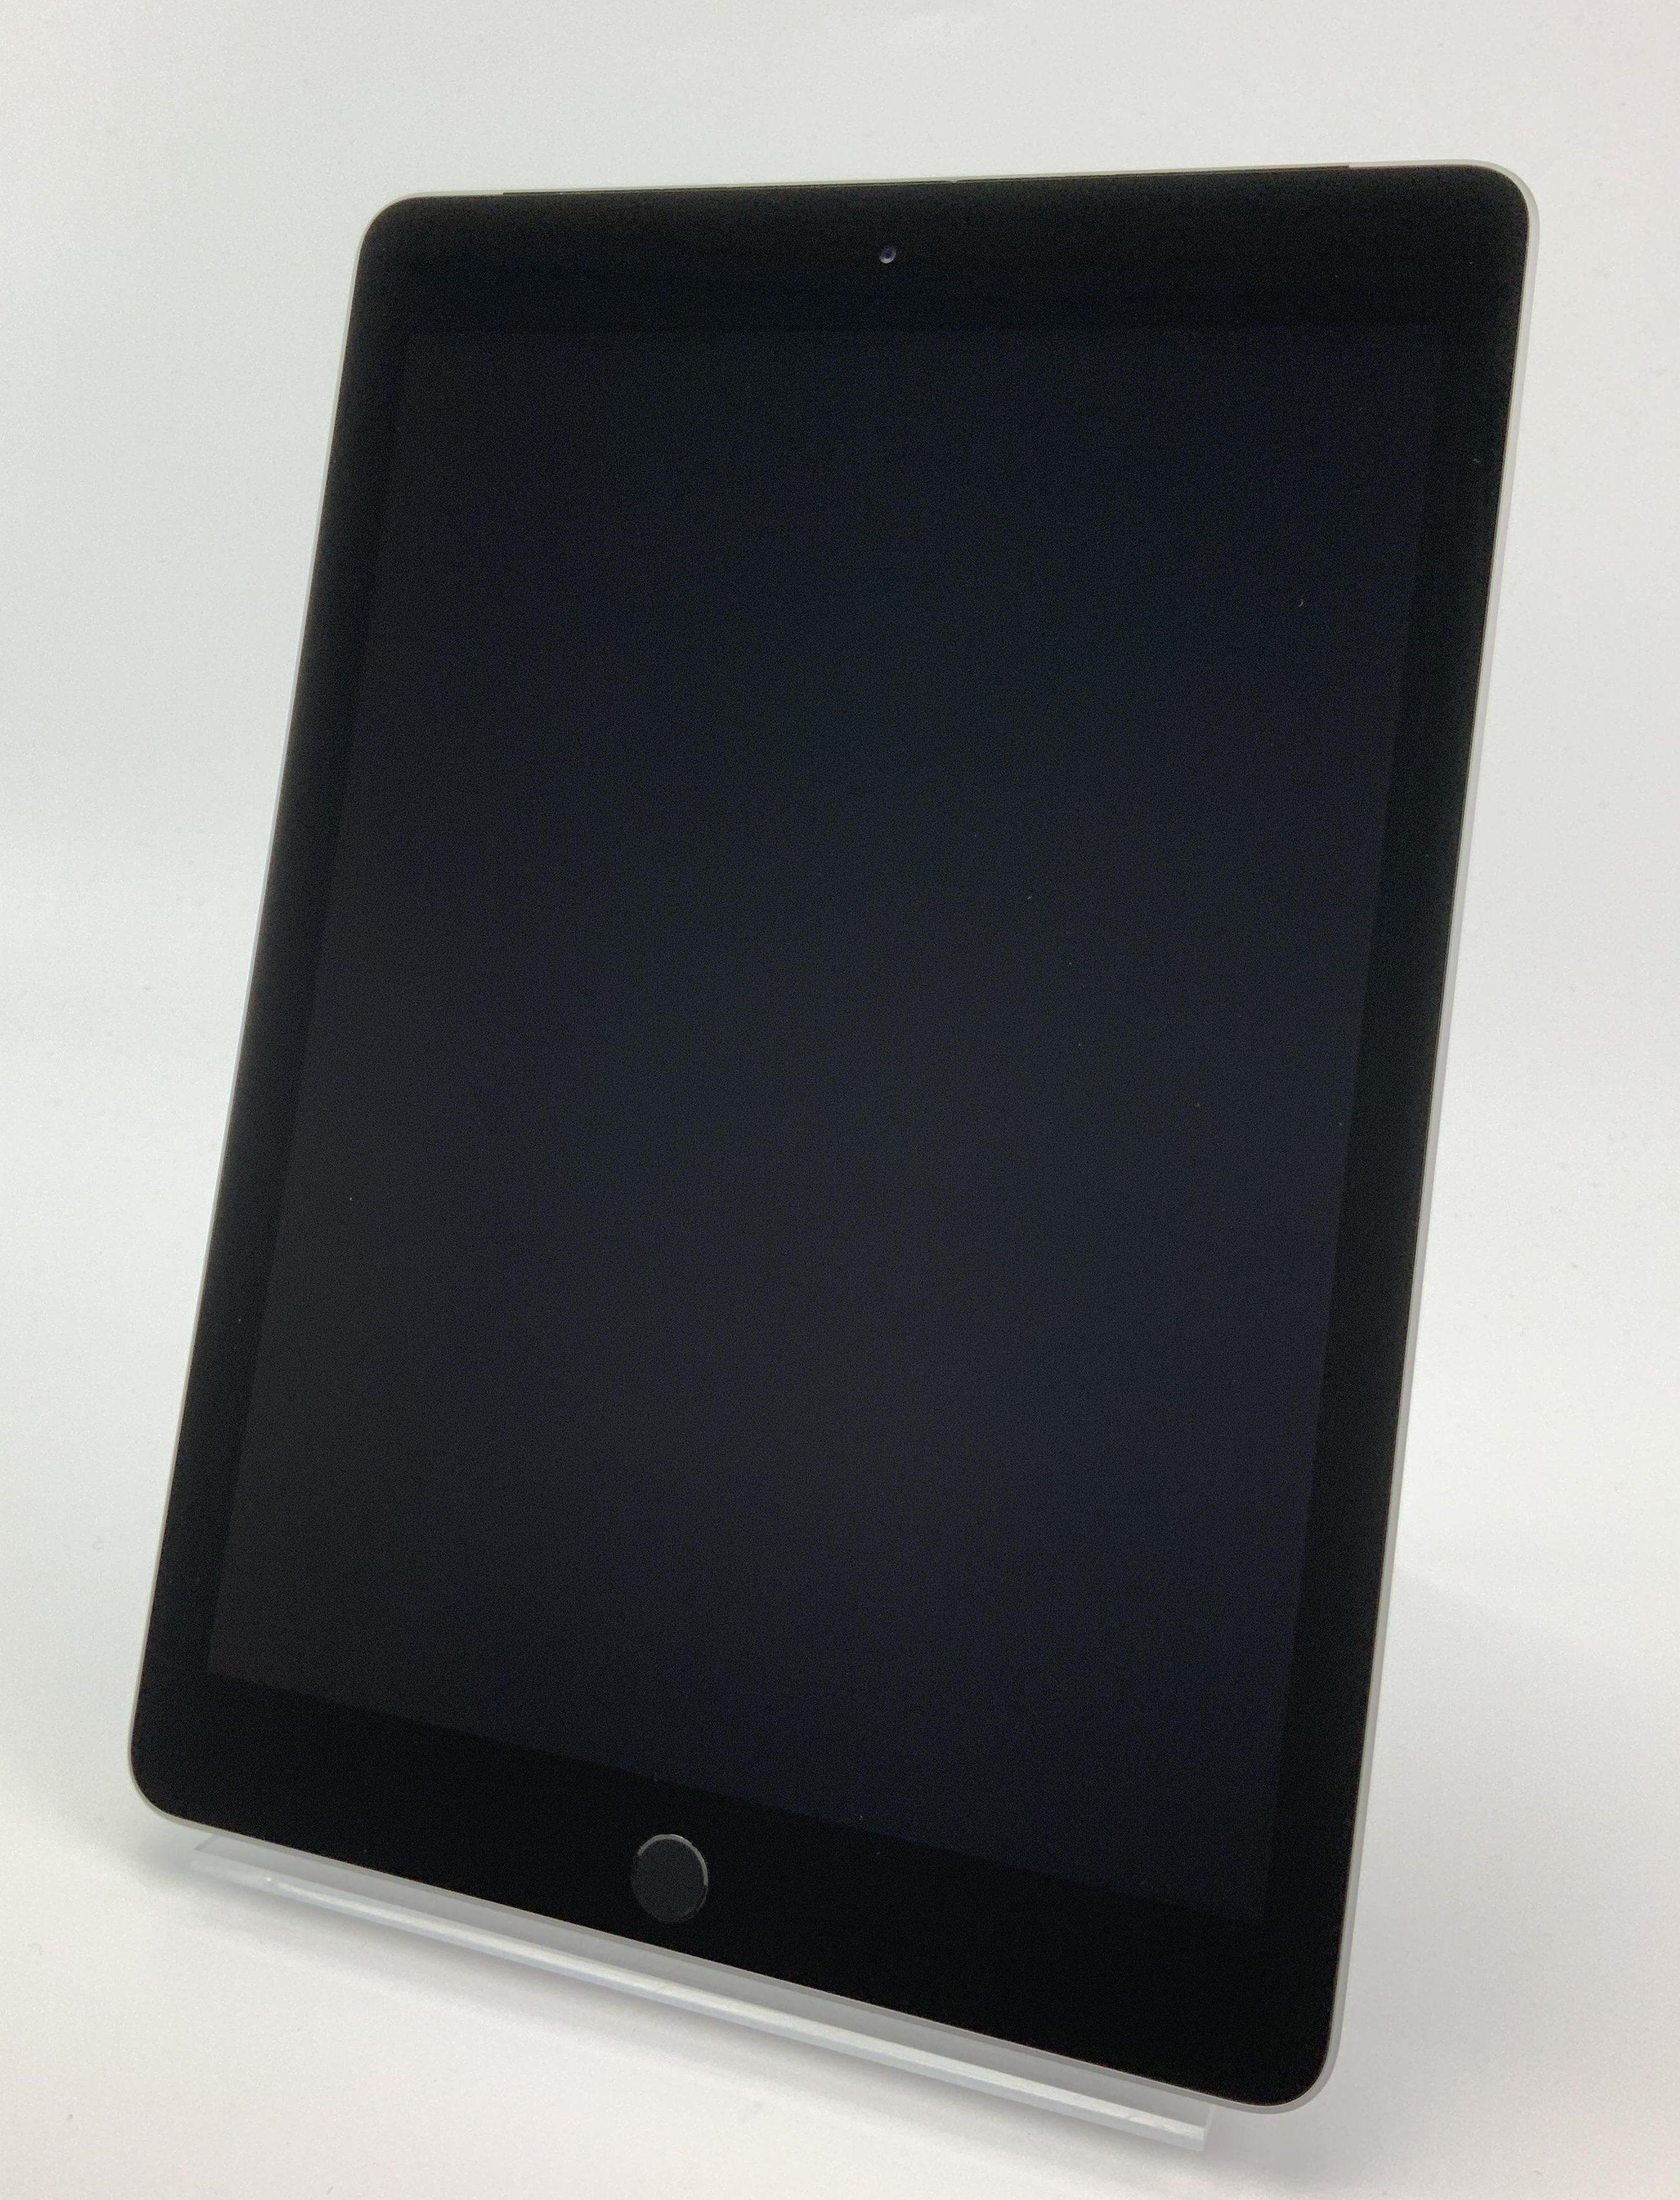 iPad 6 Wi-Fi + Cellular 32GB, 32GB, Space Gray, immagine 1